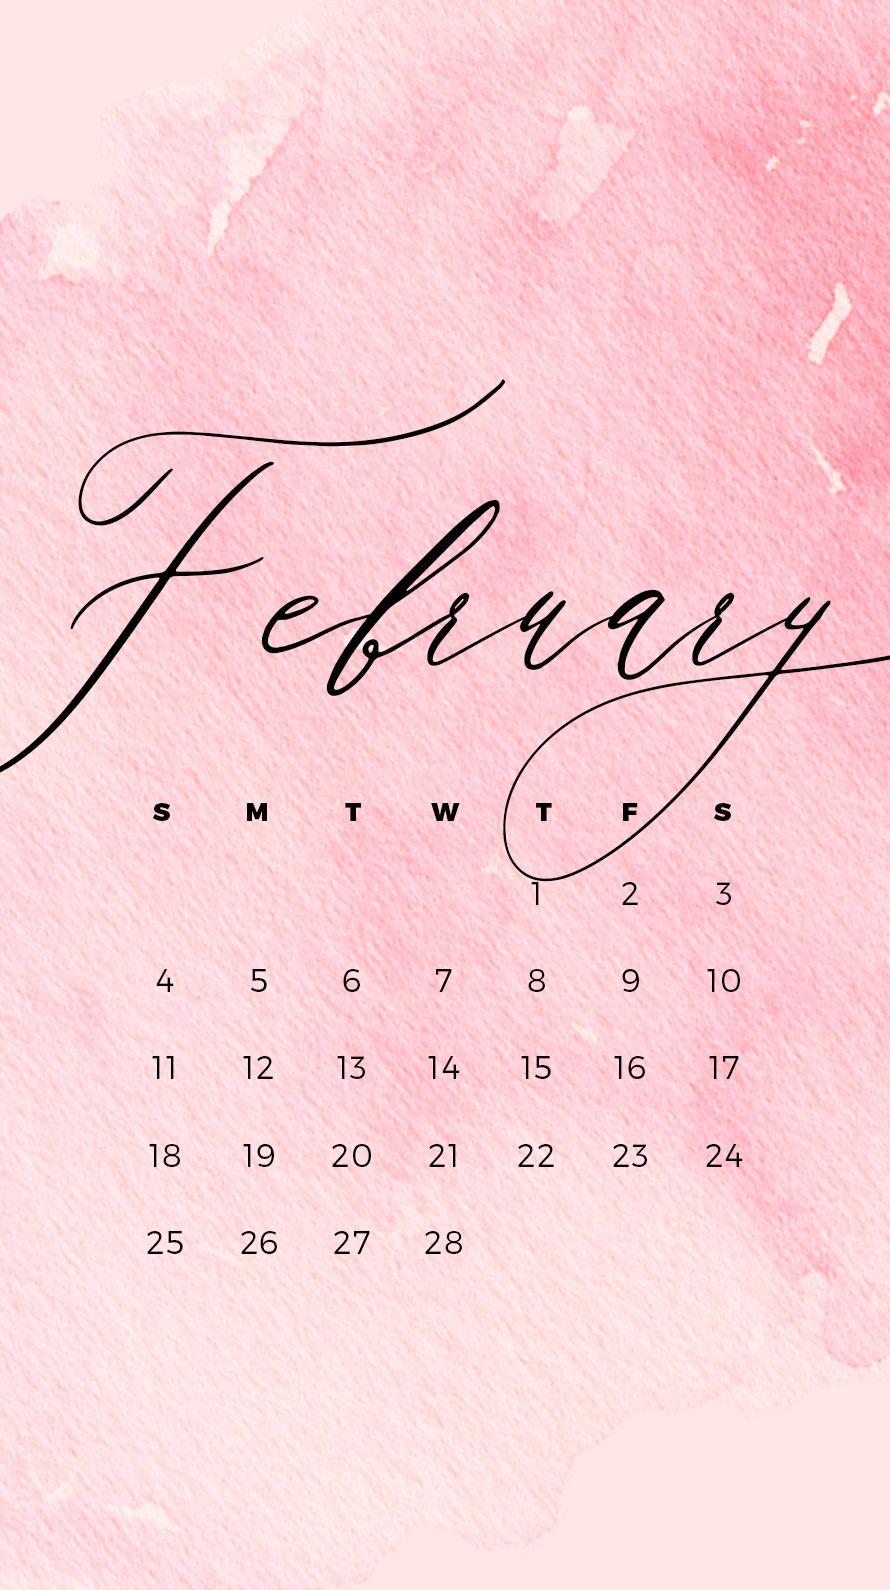 My Birthday Is On February 19 February Wallpaper Birthday Wallpaper Iphone Wallpaper